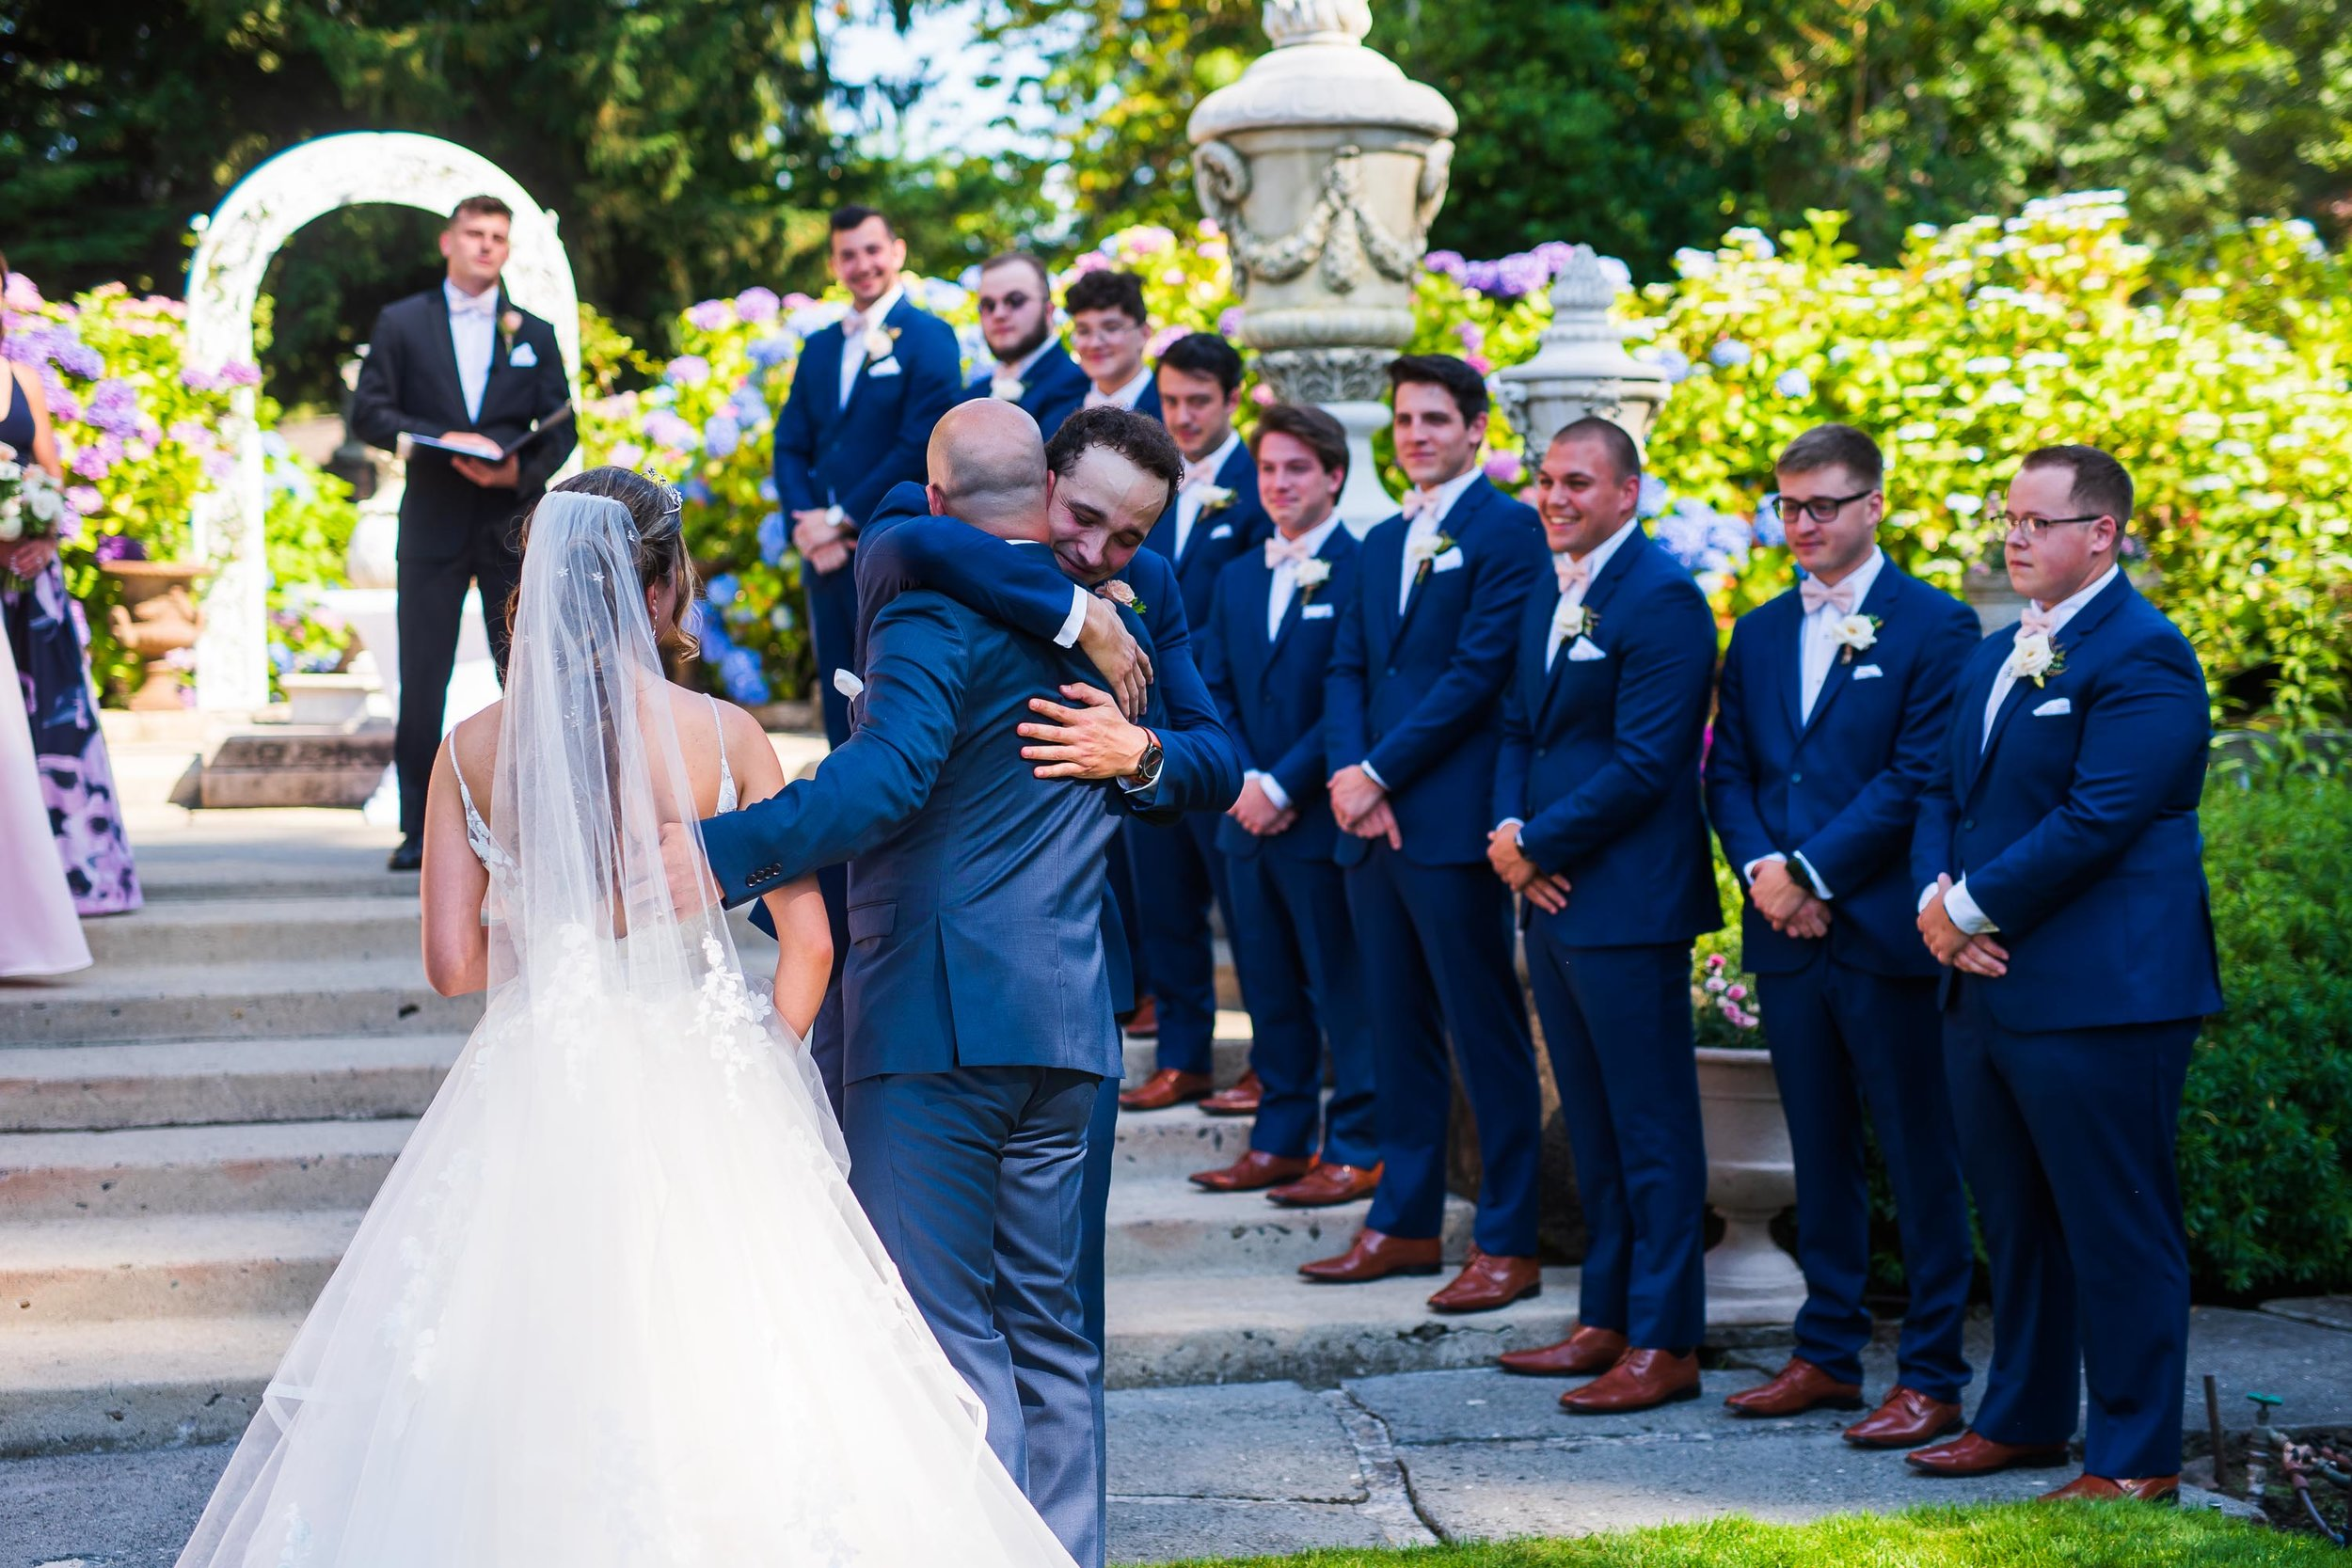 thornewood castle wedding 49.jpg